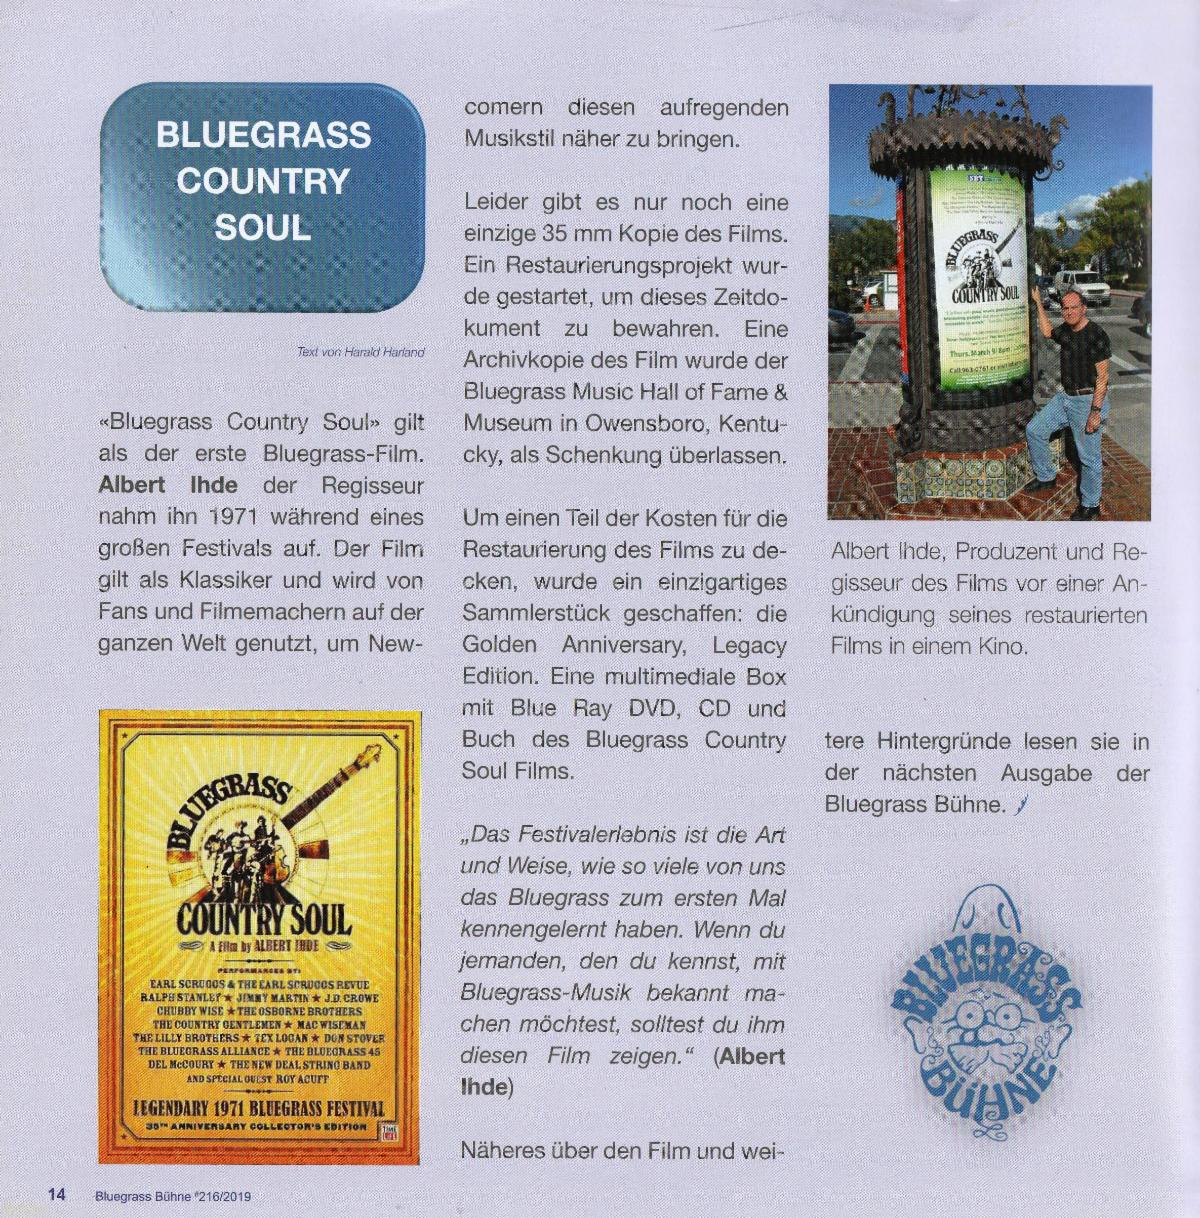 BGCS in No Fences a German Bluegrass Magazine